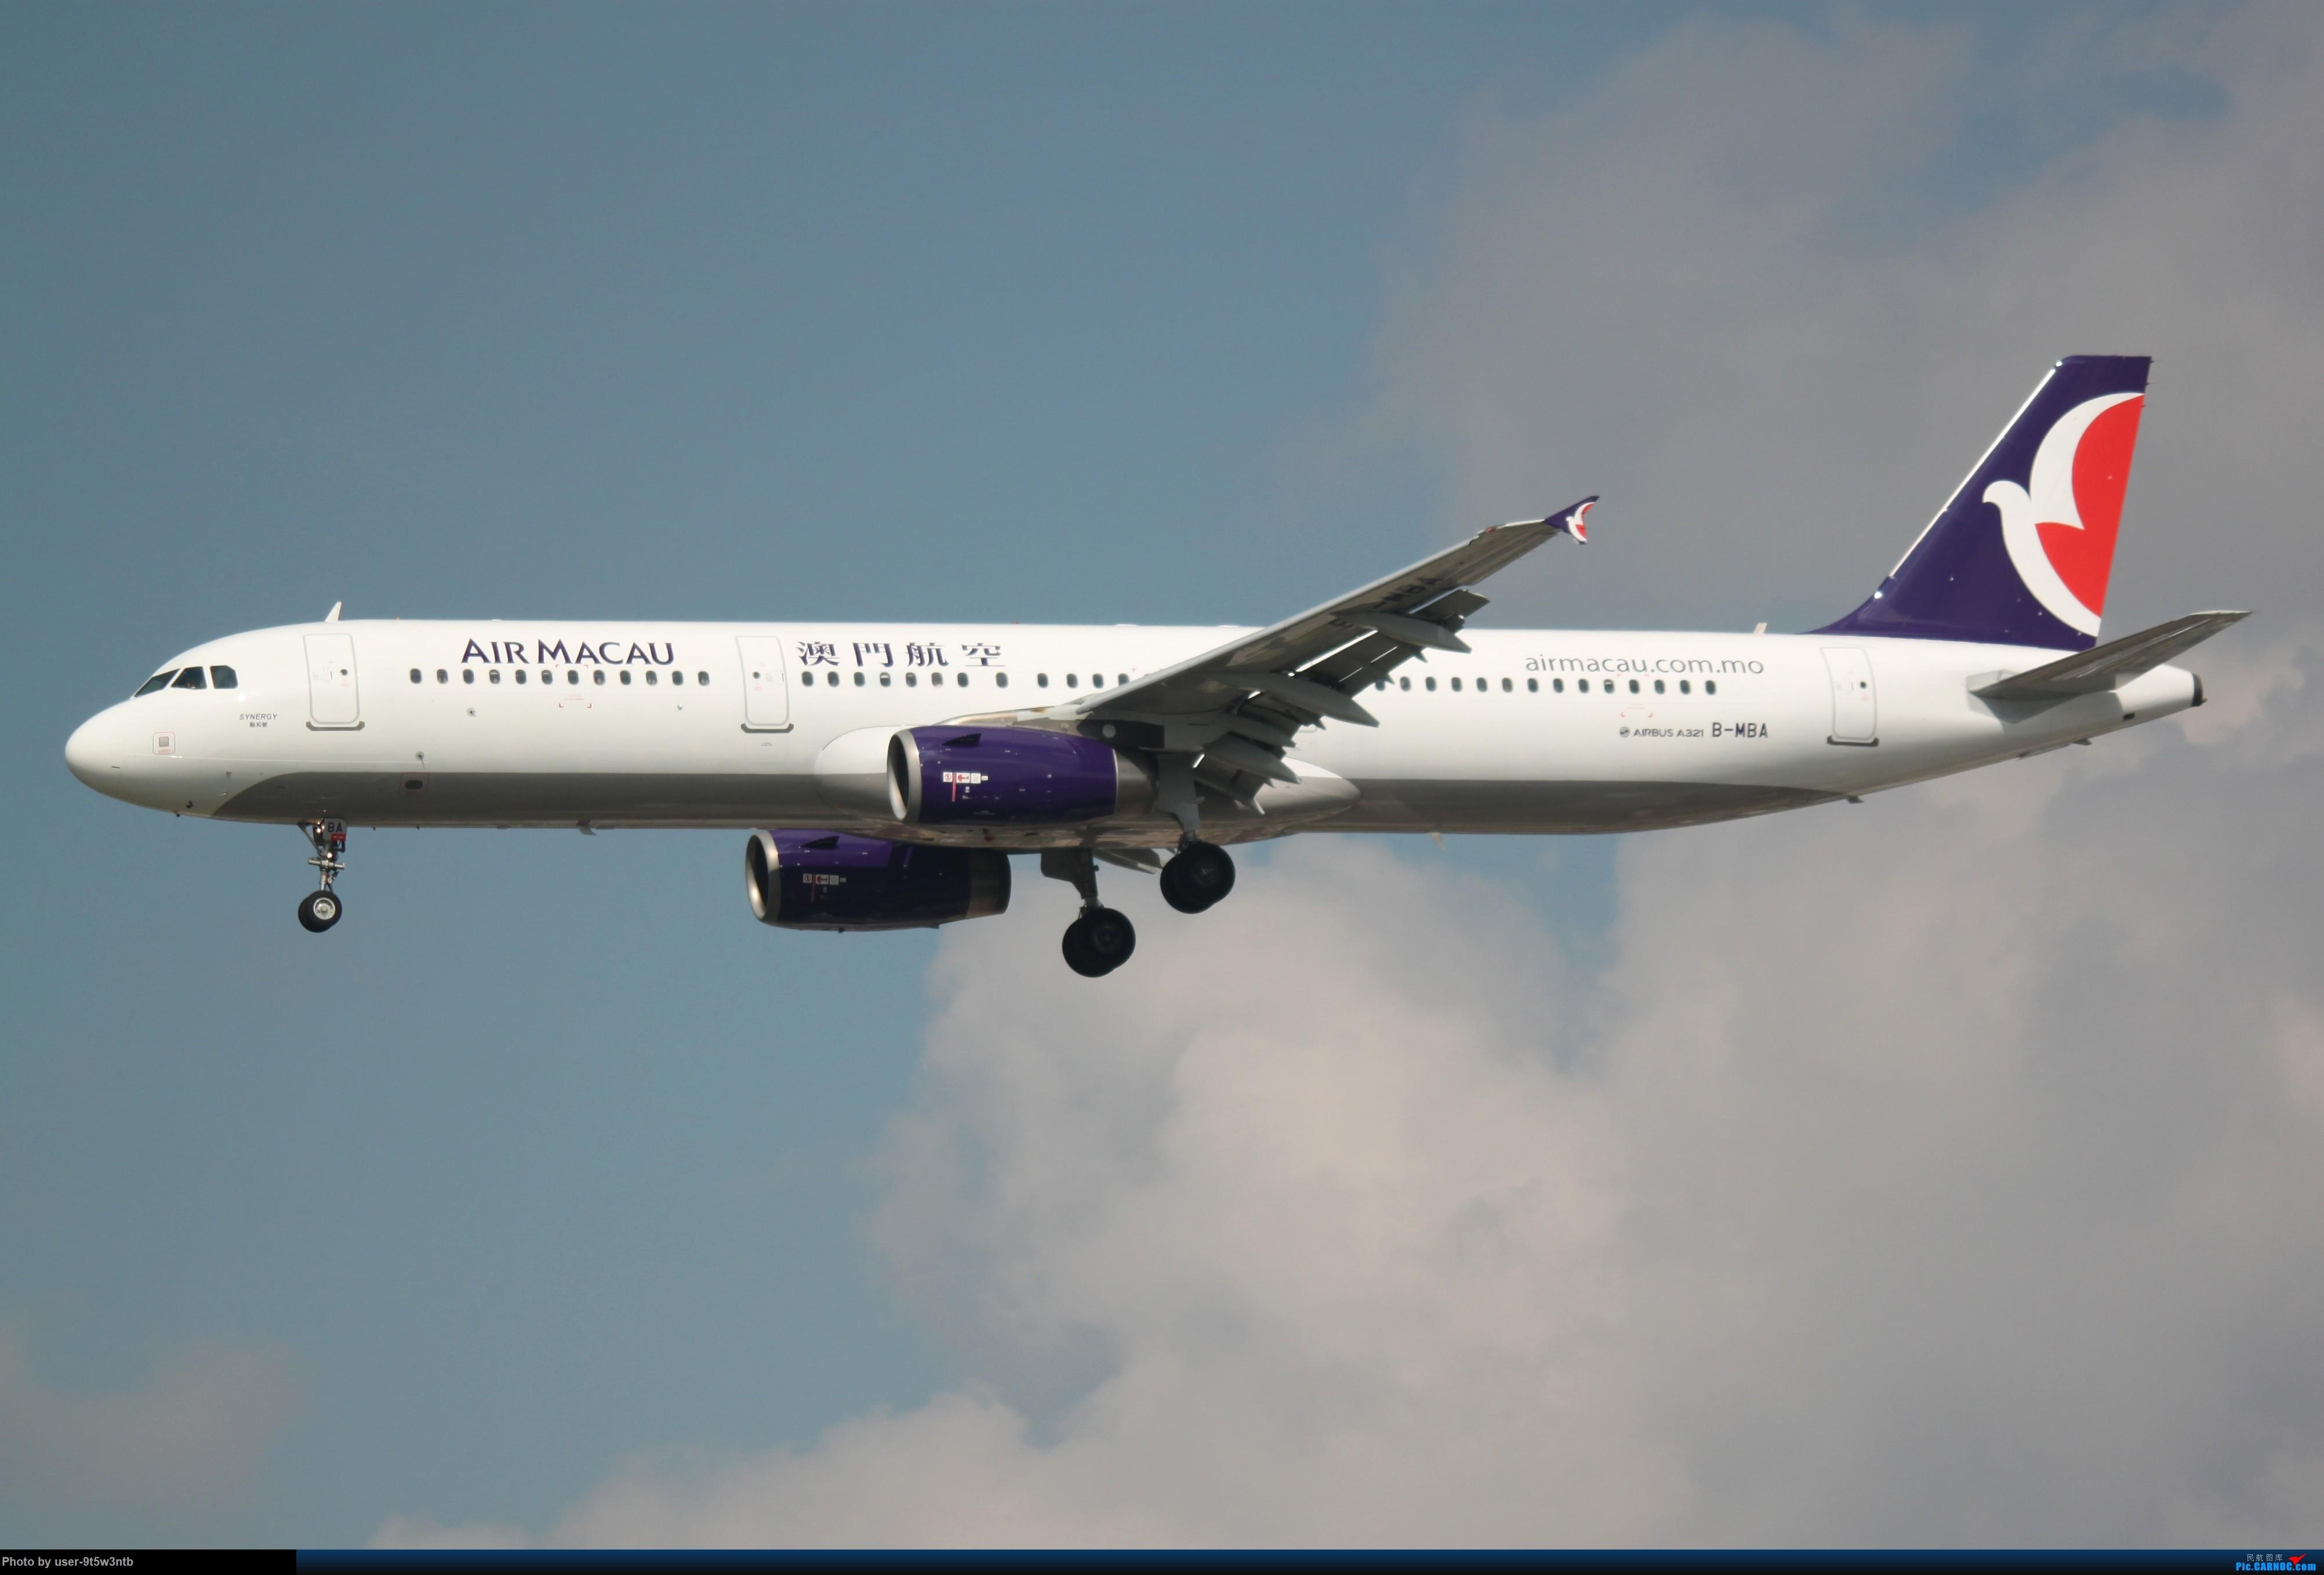 Re:[原创]虹桥机场炎热的早晨 AIRBUS A321-200 B-MBA 中国上海虹桥国际机场